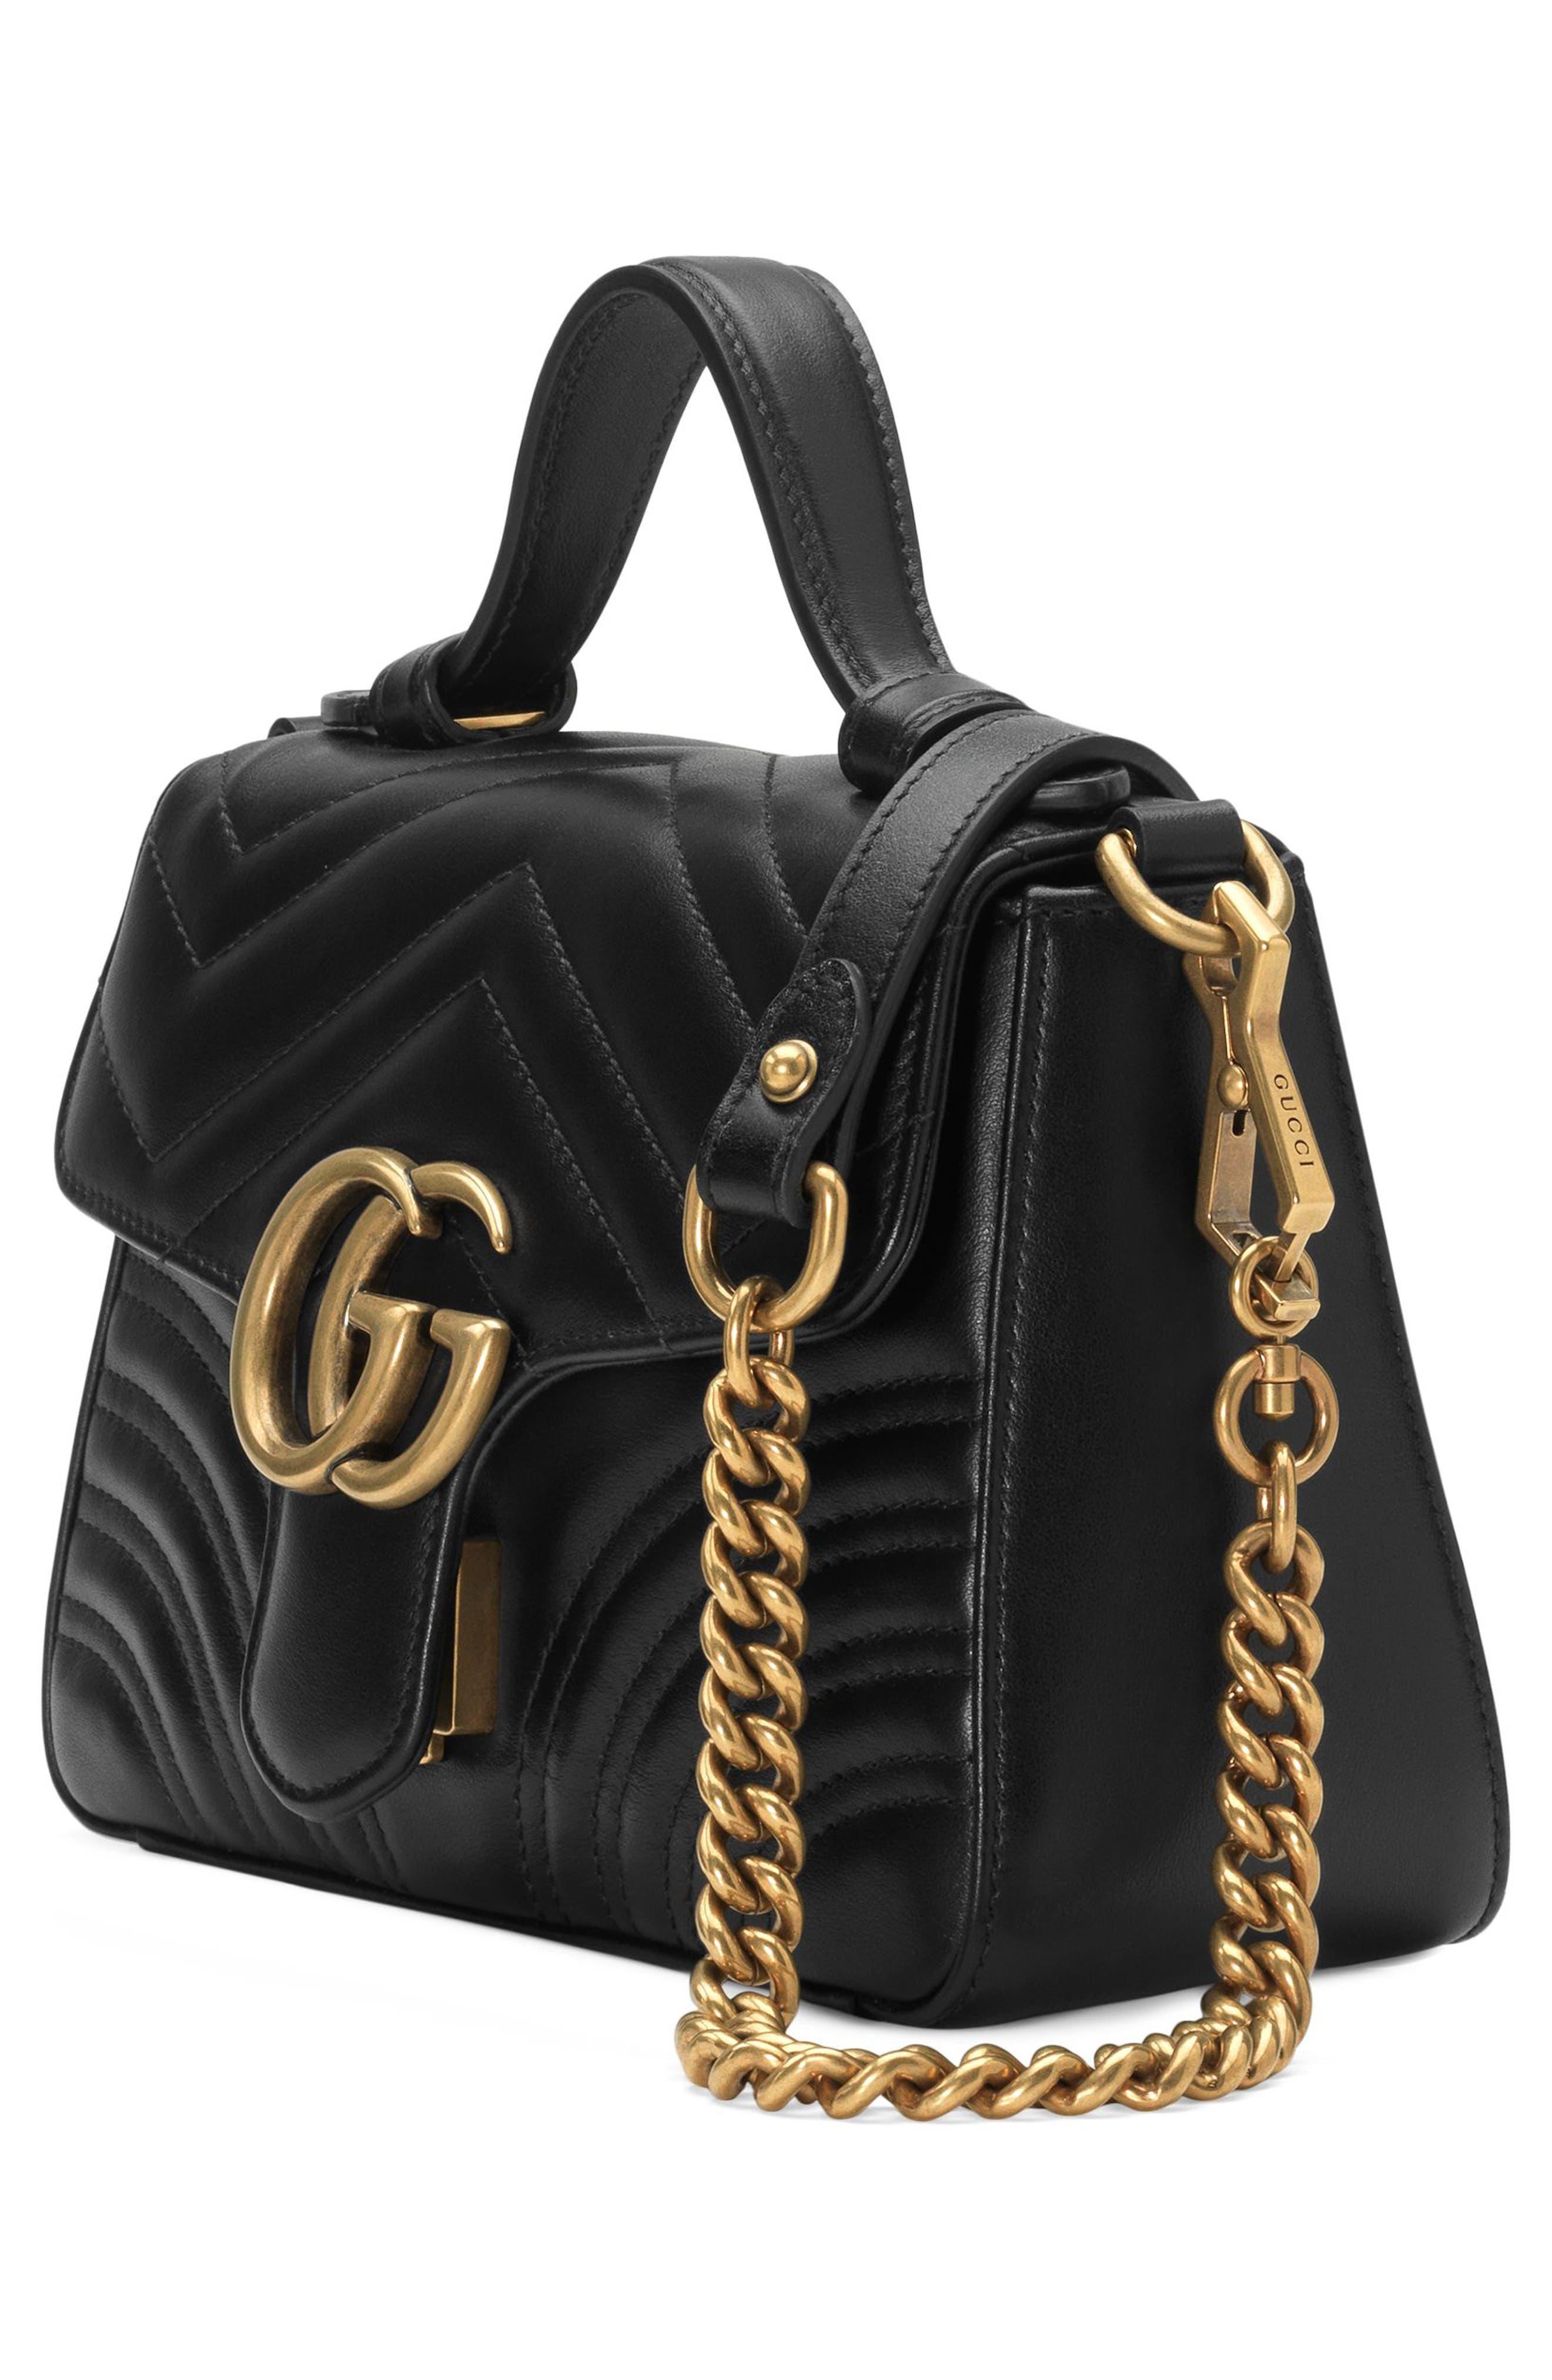 Marmont 2.0 Leather Top Handle Bag,                             Alternate thumbnail 4, color,                             NERO